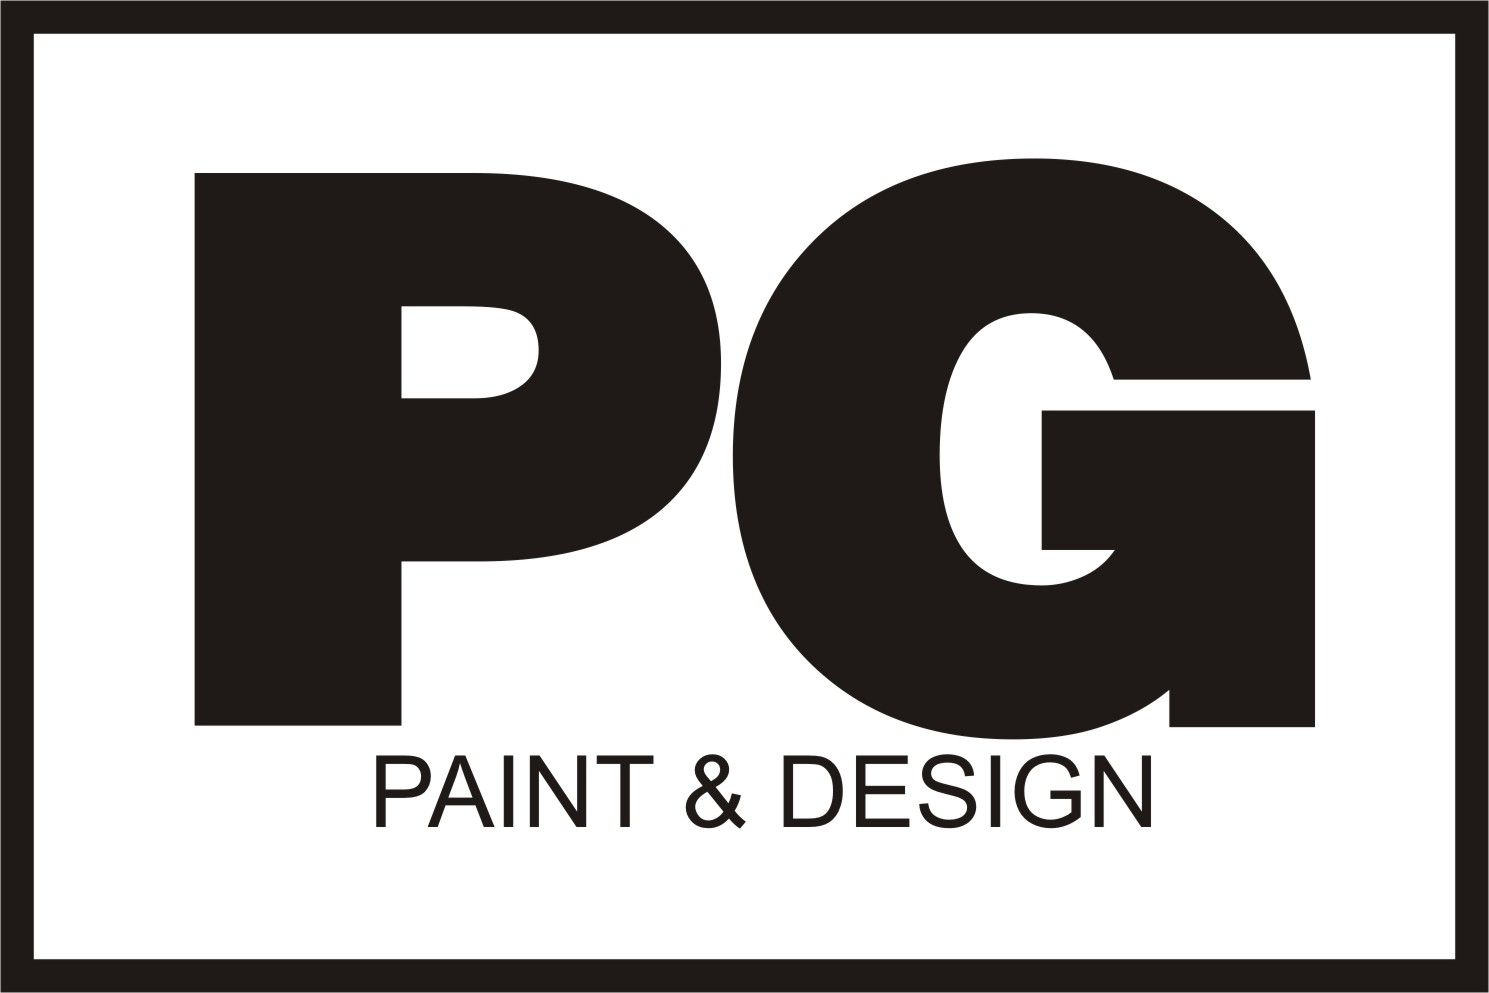 Ottawa House Painters Services Reviews,Testimonials for PG PAINT & DESIGN